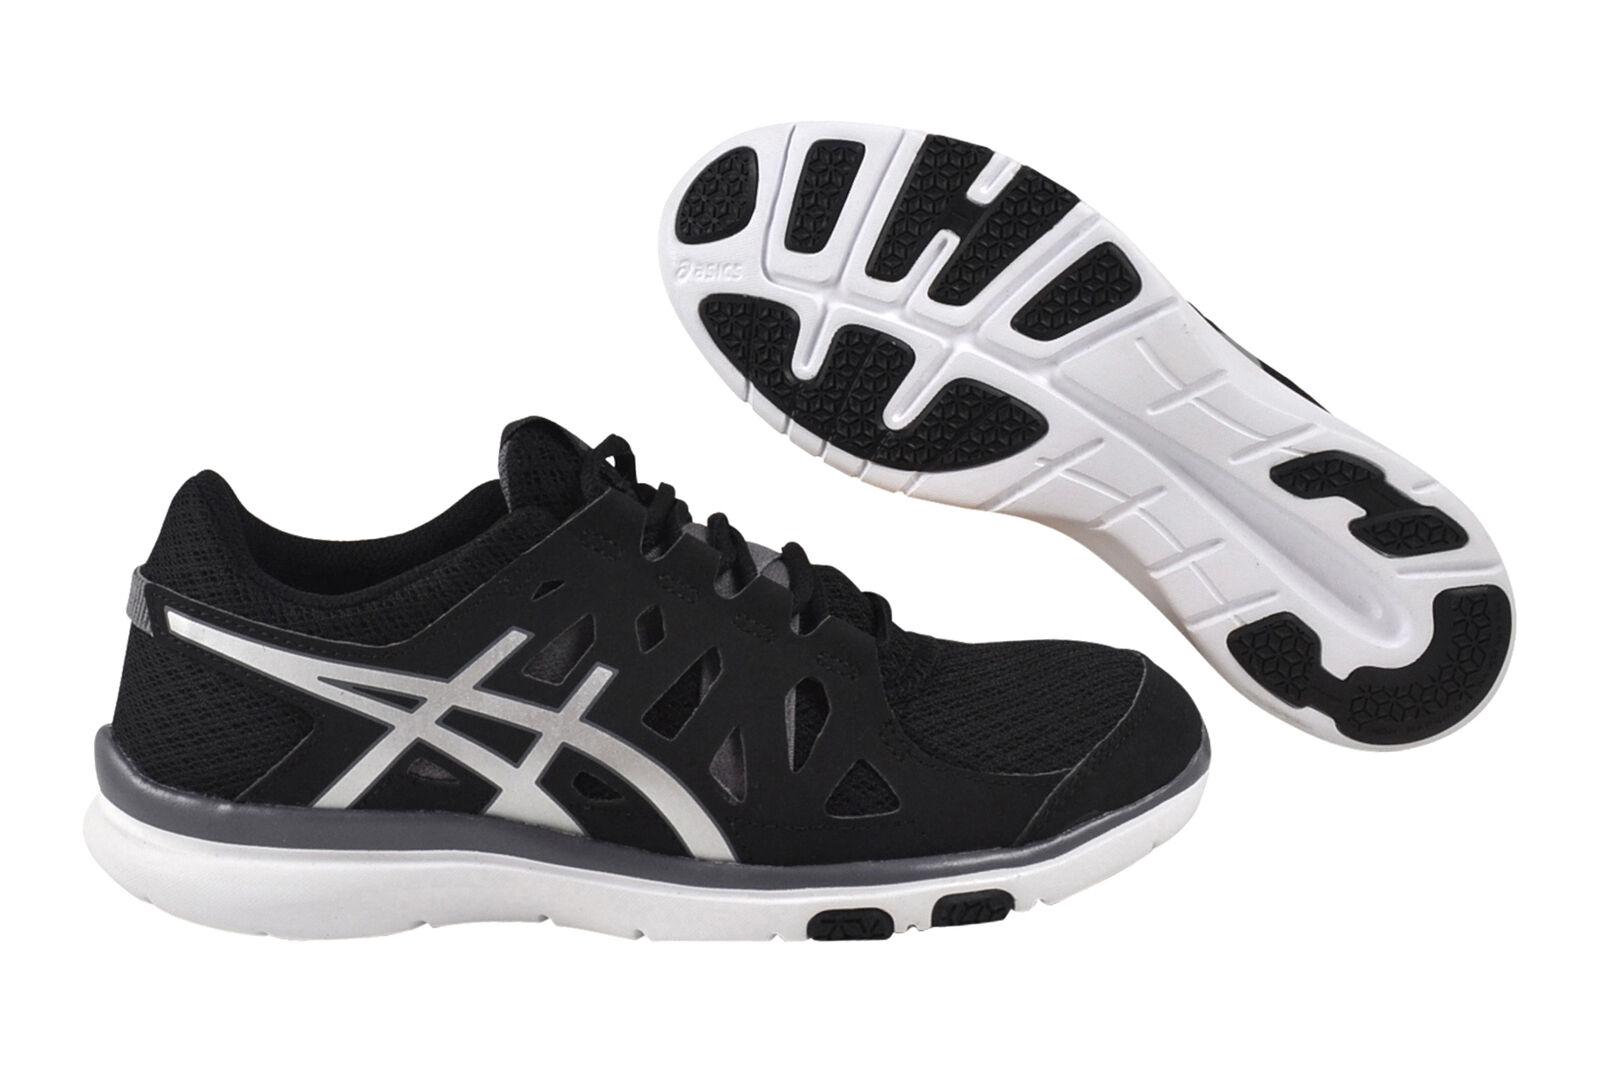 Asics GEL-Fit Tempo black/silver/charcoal Sneaker/Schuhe S464N 9093 schwarz